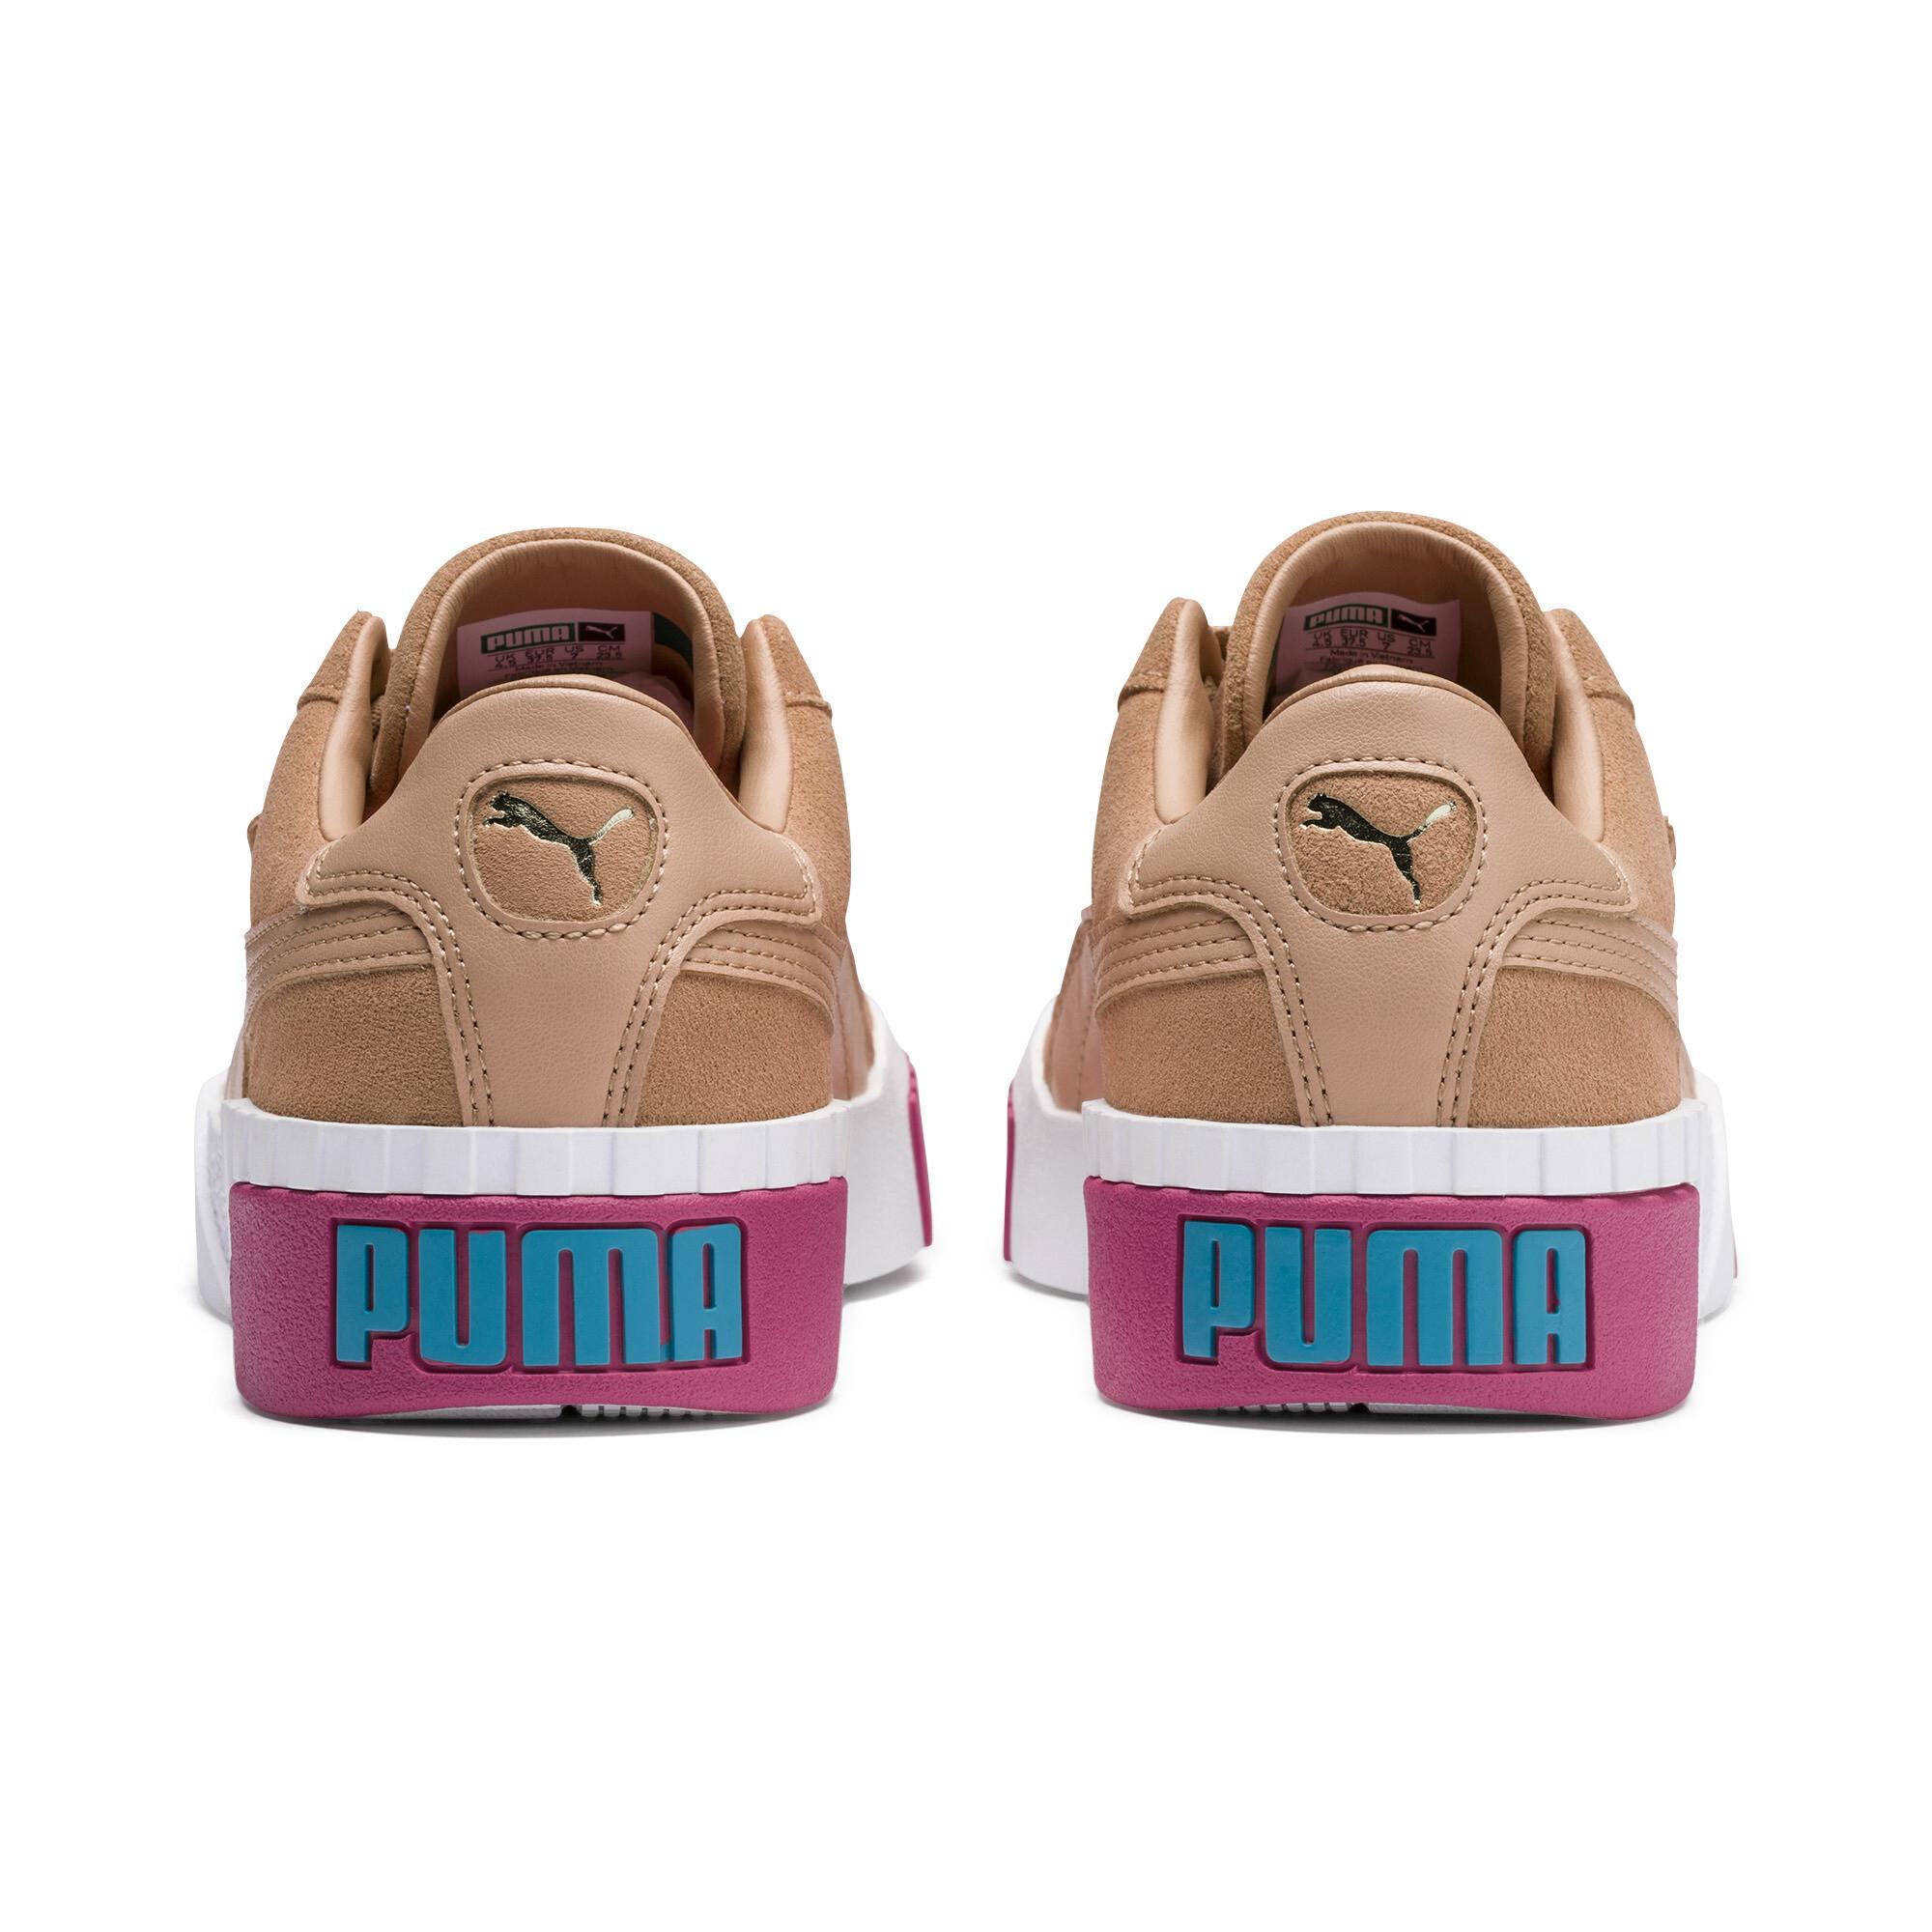 Image Puma Cali Suede Women's Sneakers #4